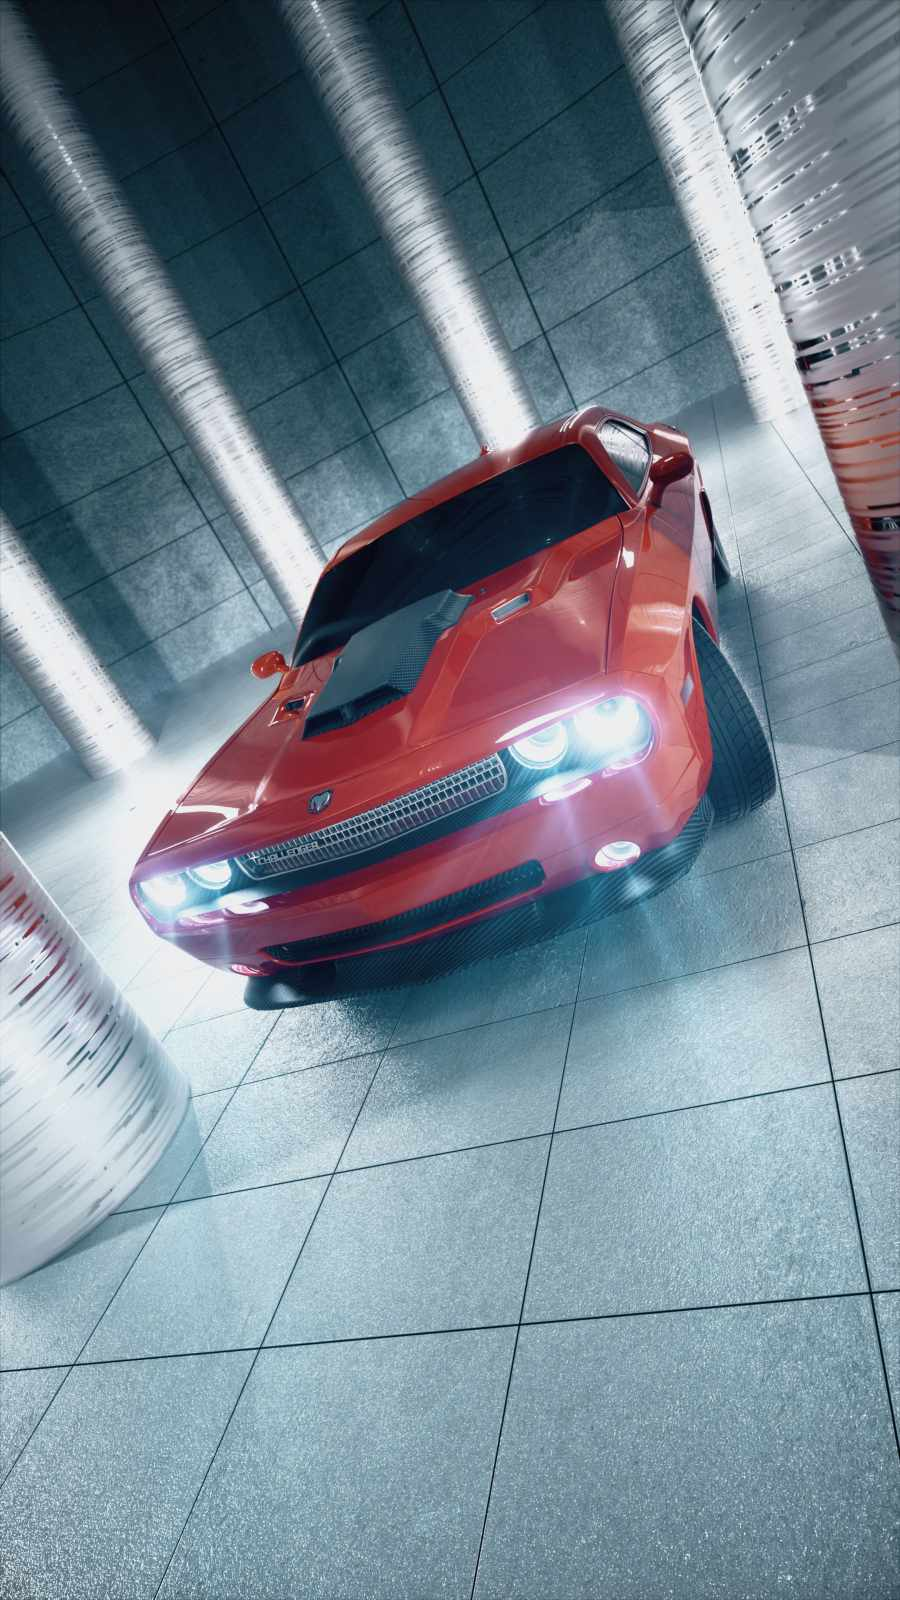 SRT Dodge Challenger